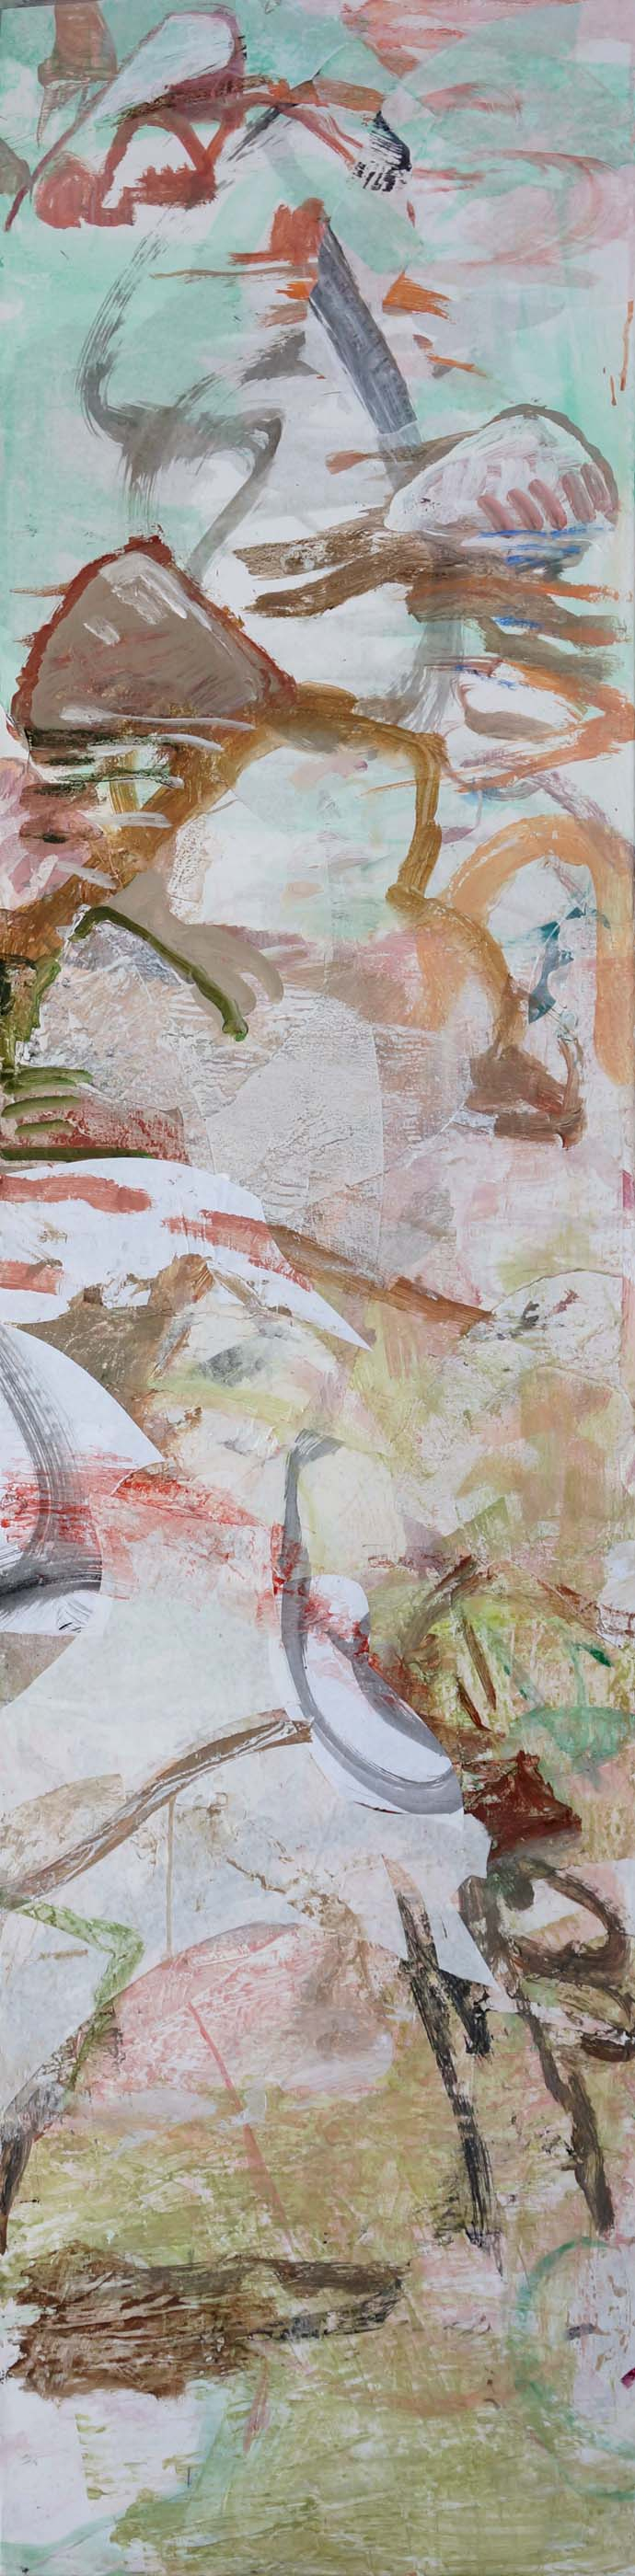 "3/11/13 version: bada creek 72x18""  acrylic & collaged paper on canvas"